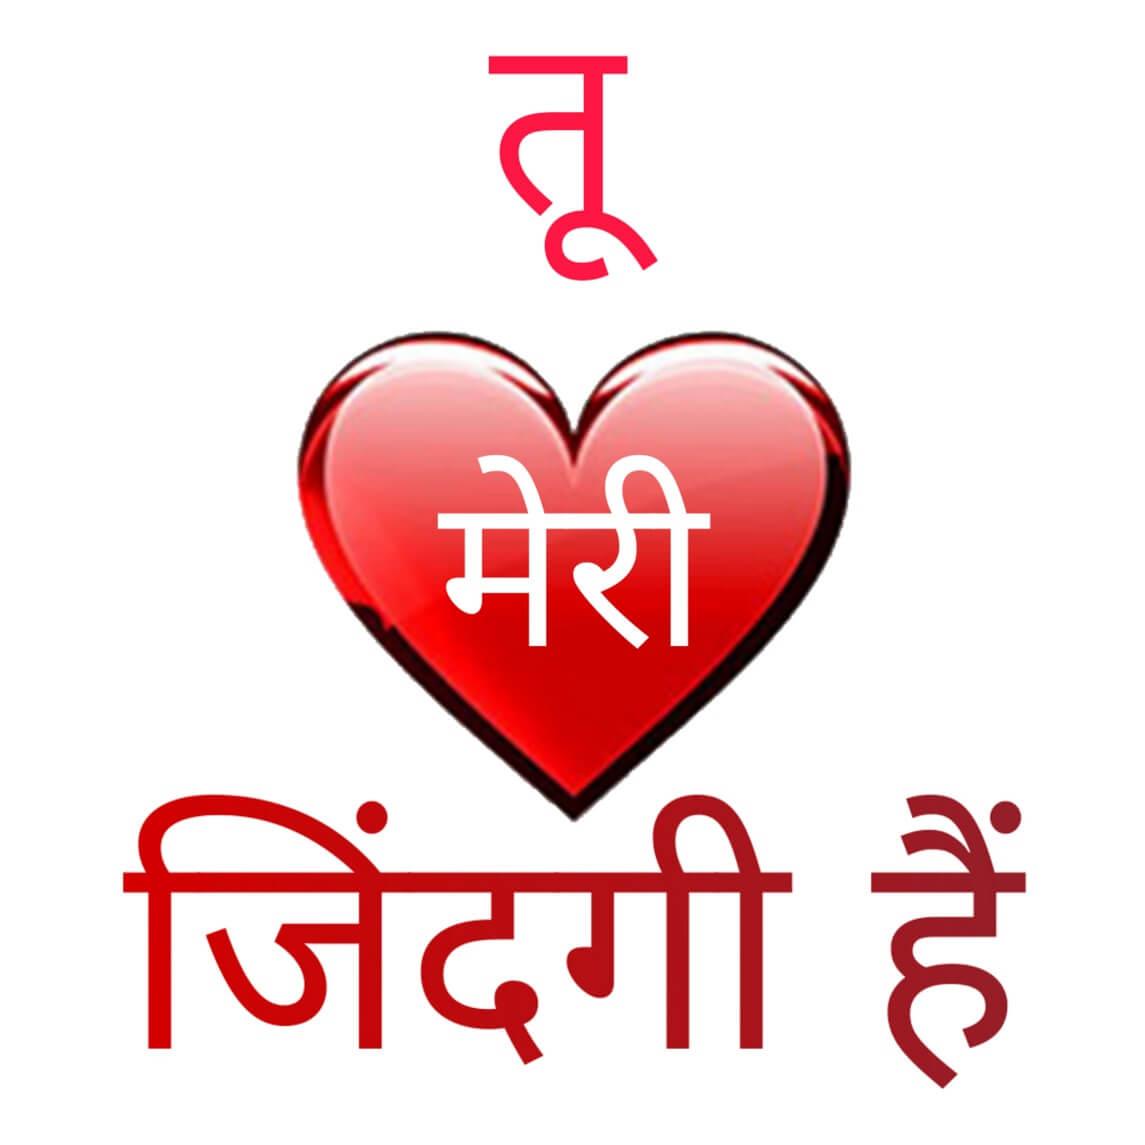 Whatsapp Dp Images In Hindi - Name Love Whatsapp Dp - HD Wallpaper